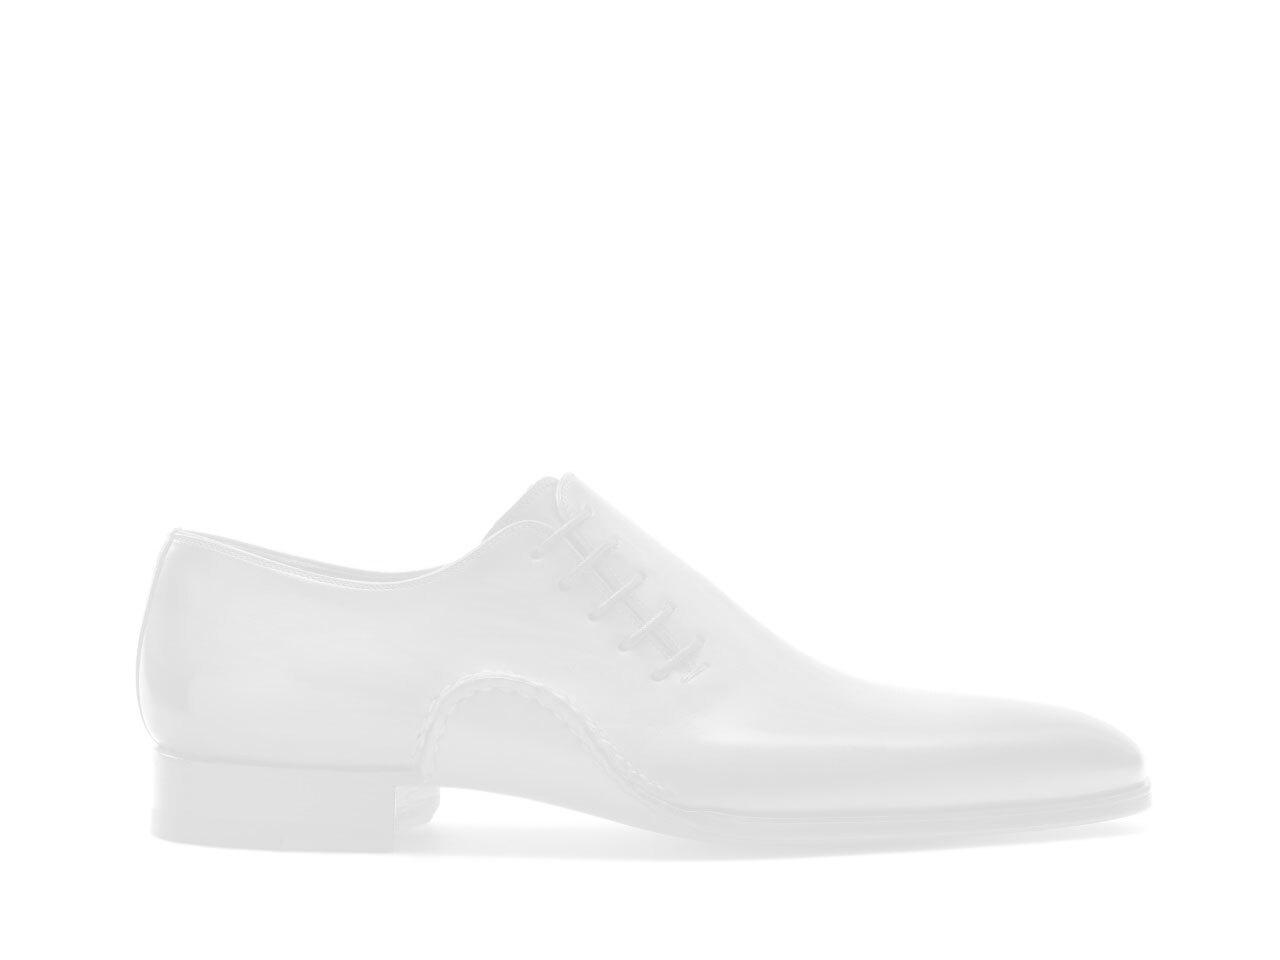 Pair of the Magnanni Allariz White Men's Sneakers